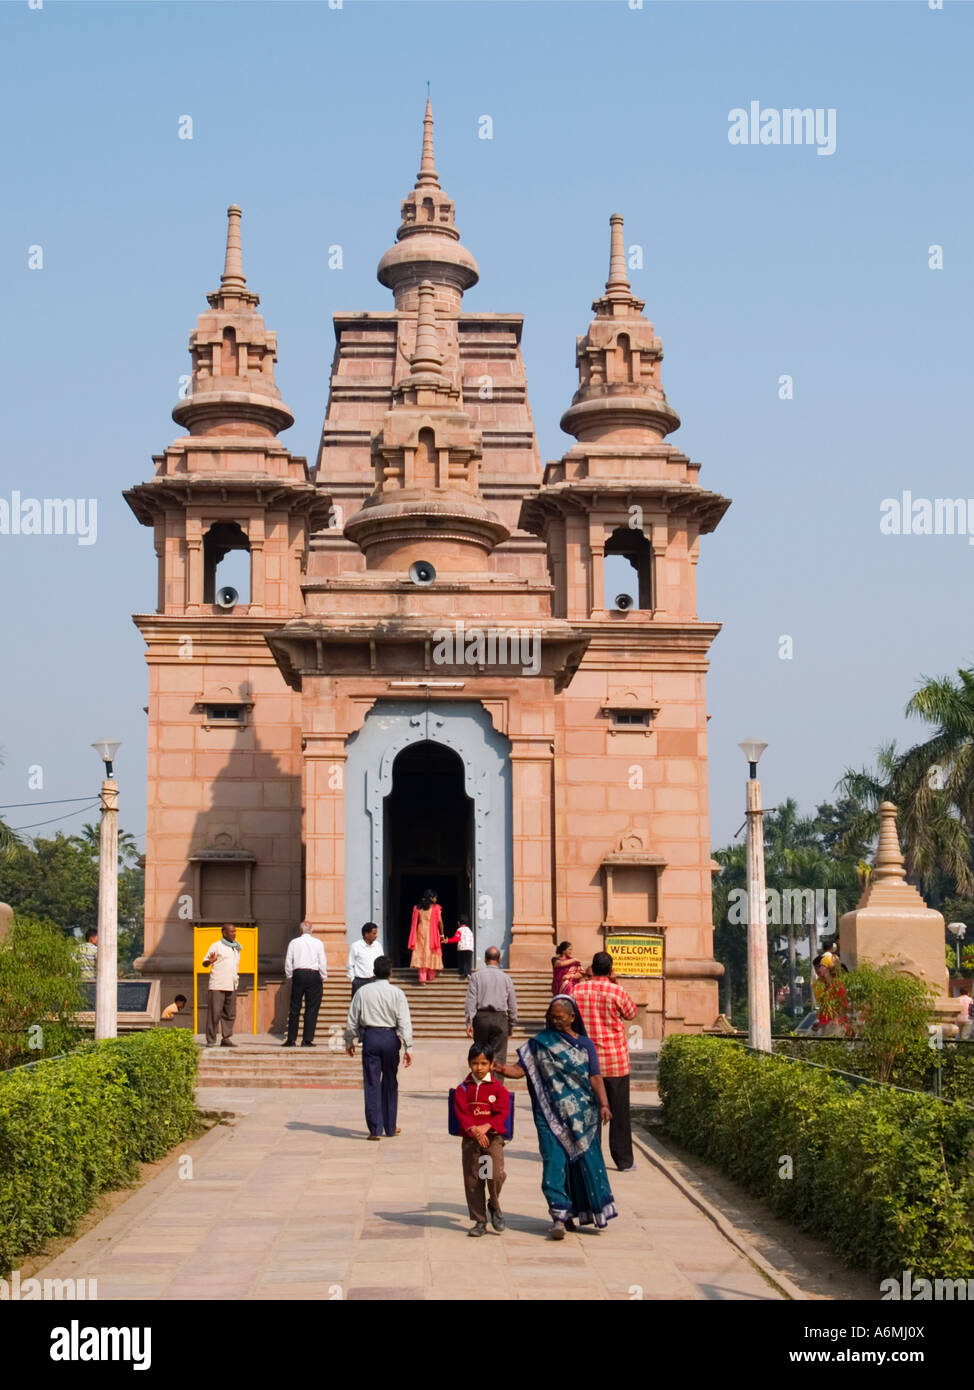 New Mulagandha Kutir Vihara Buddhist temple 'Isipatana Deer Park' where Buddha delivered first sermon Sarnath - Stock Image